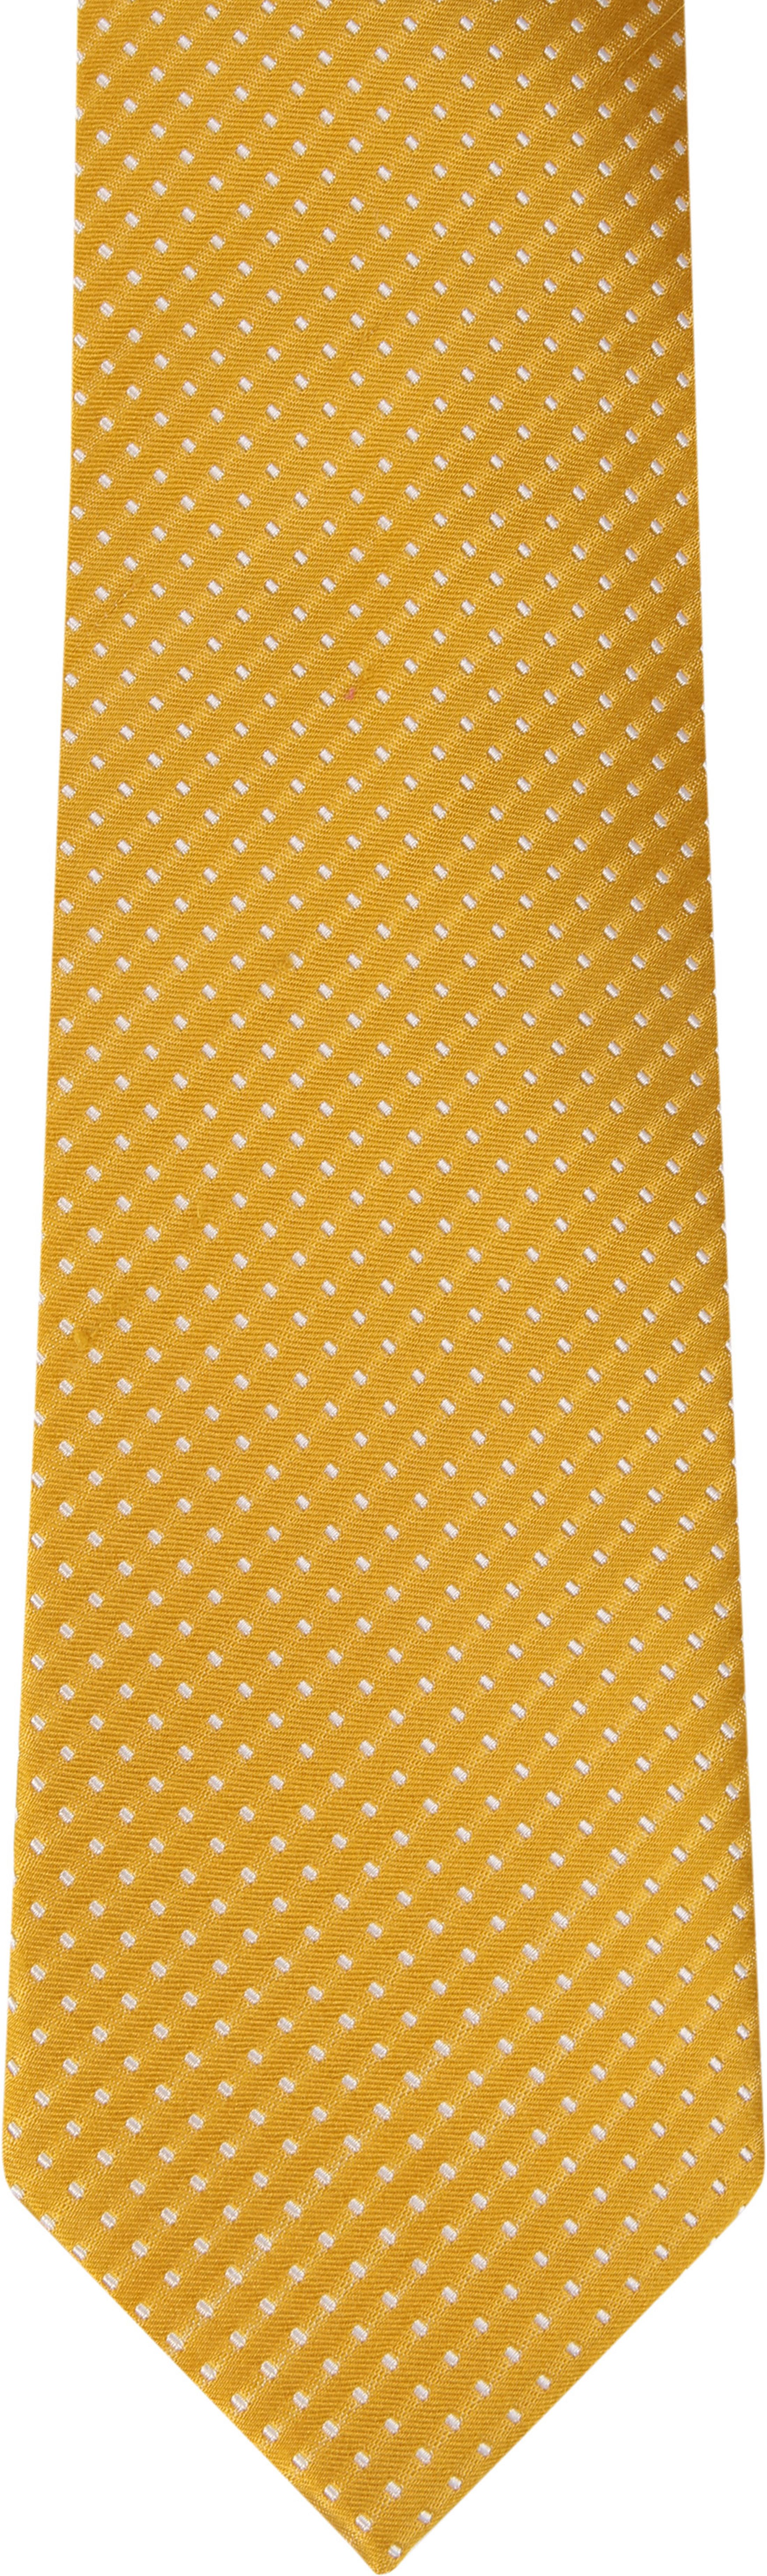 Suitable Krawatte Seide Gelb F91-4 foto 1